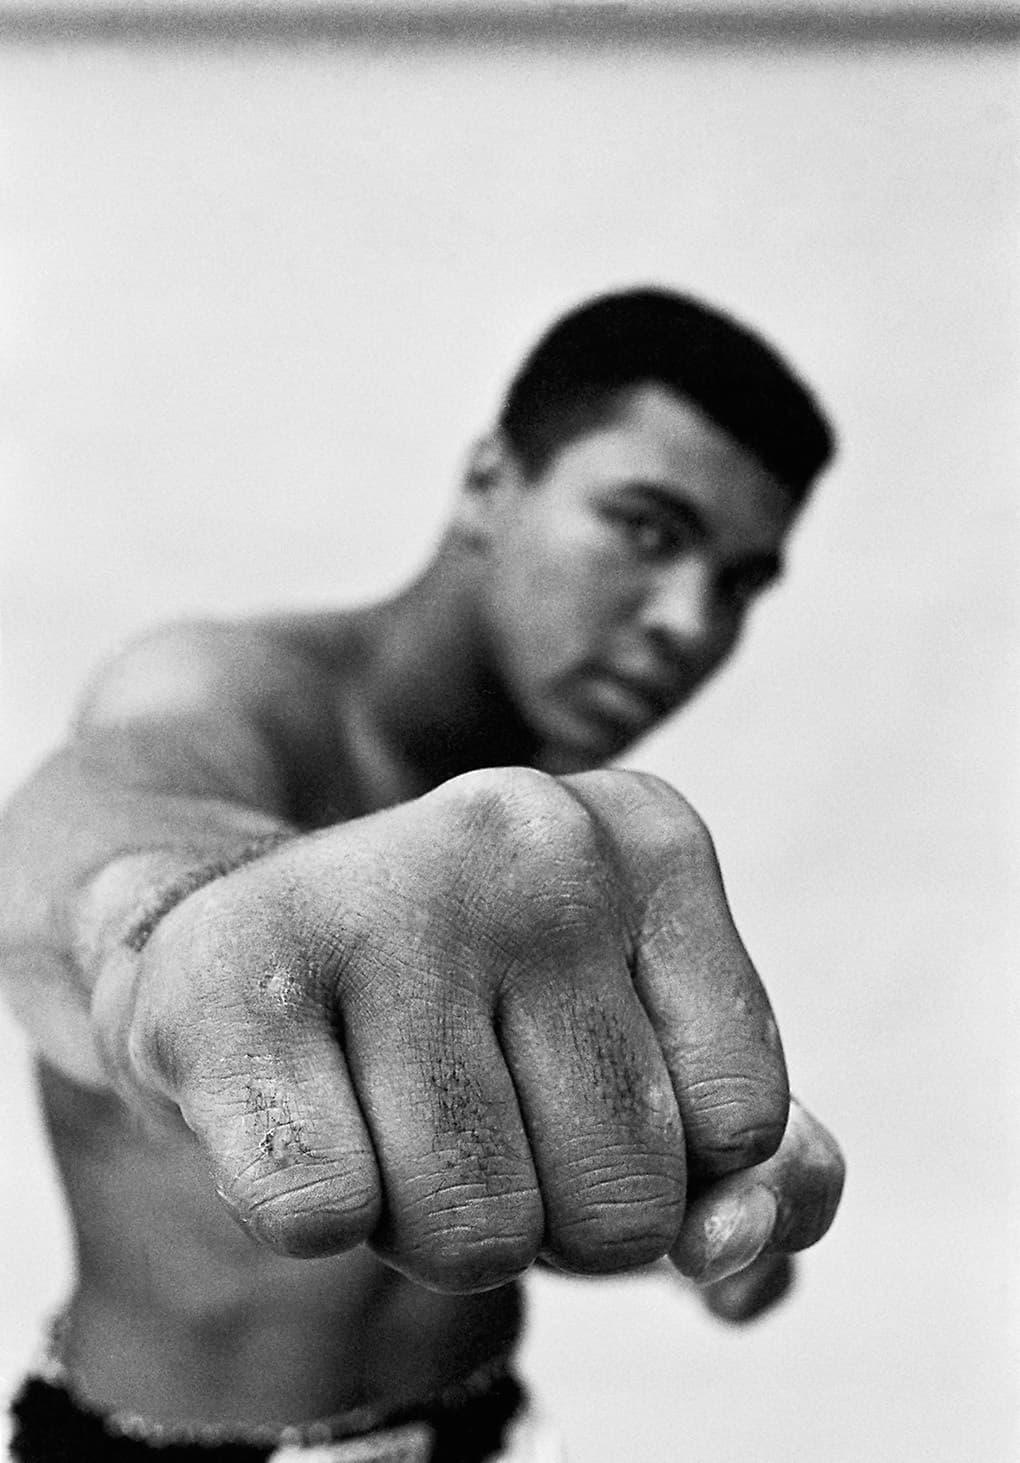 Thomas Hoepker Muhammad Ali Showing Off His Right Fist